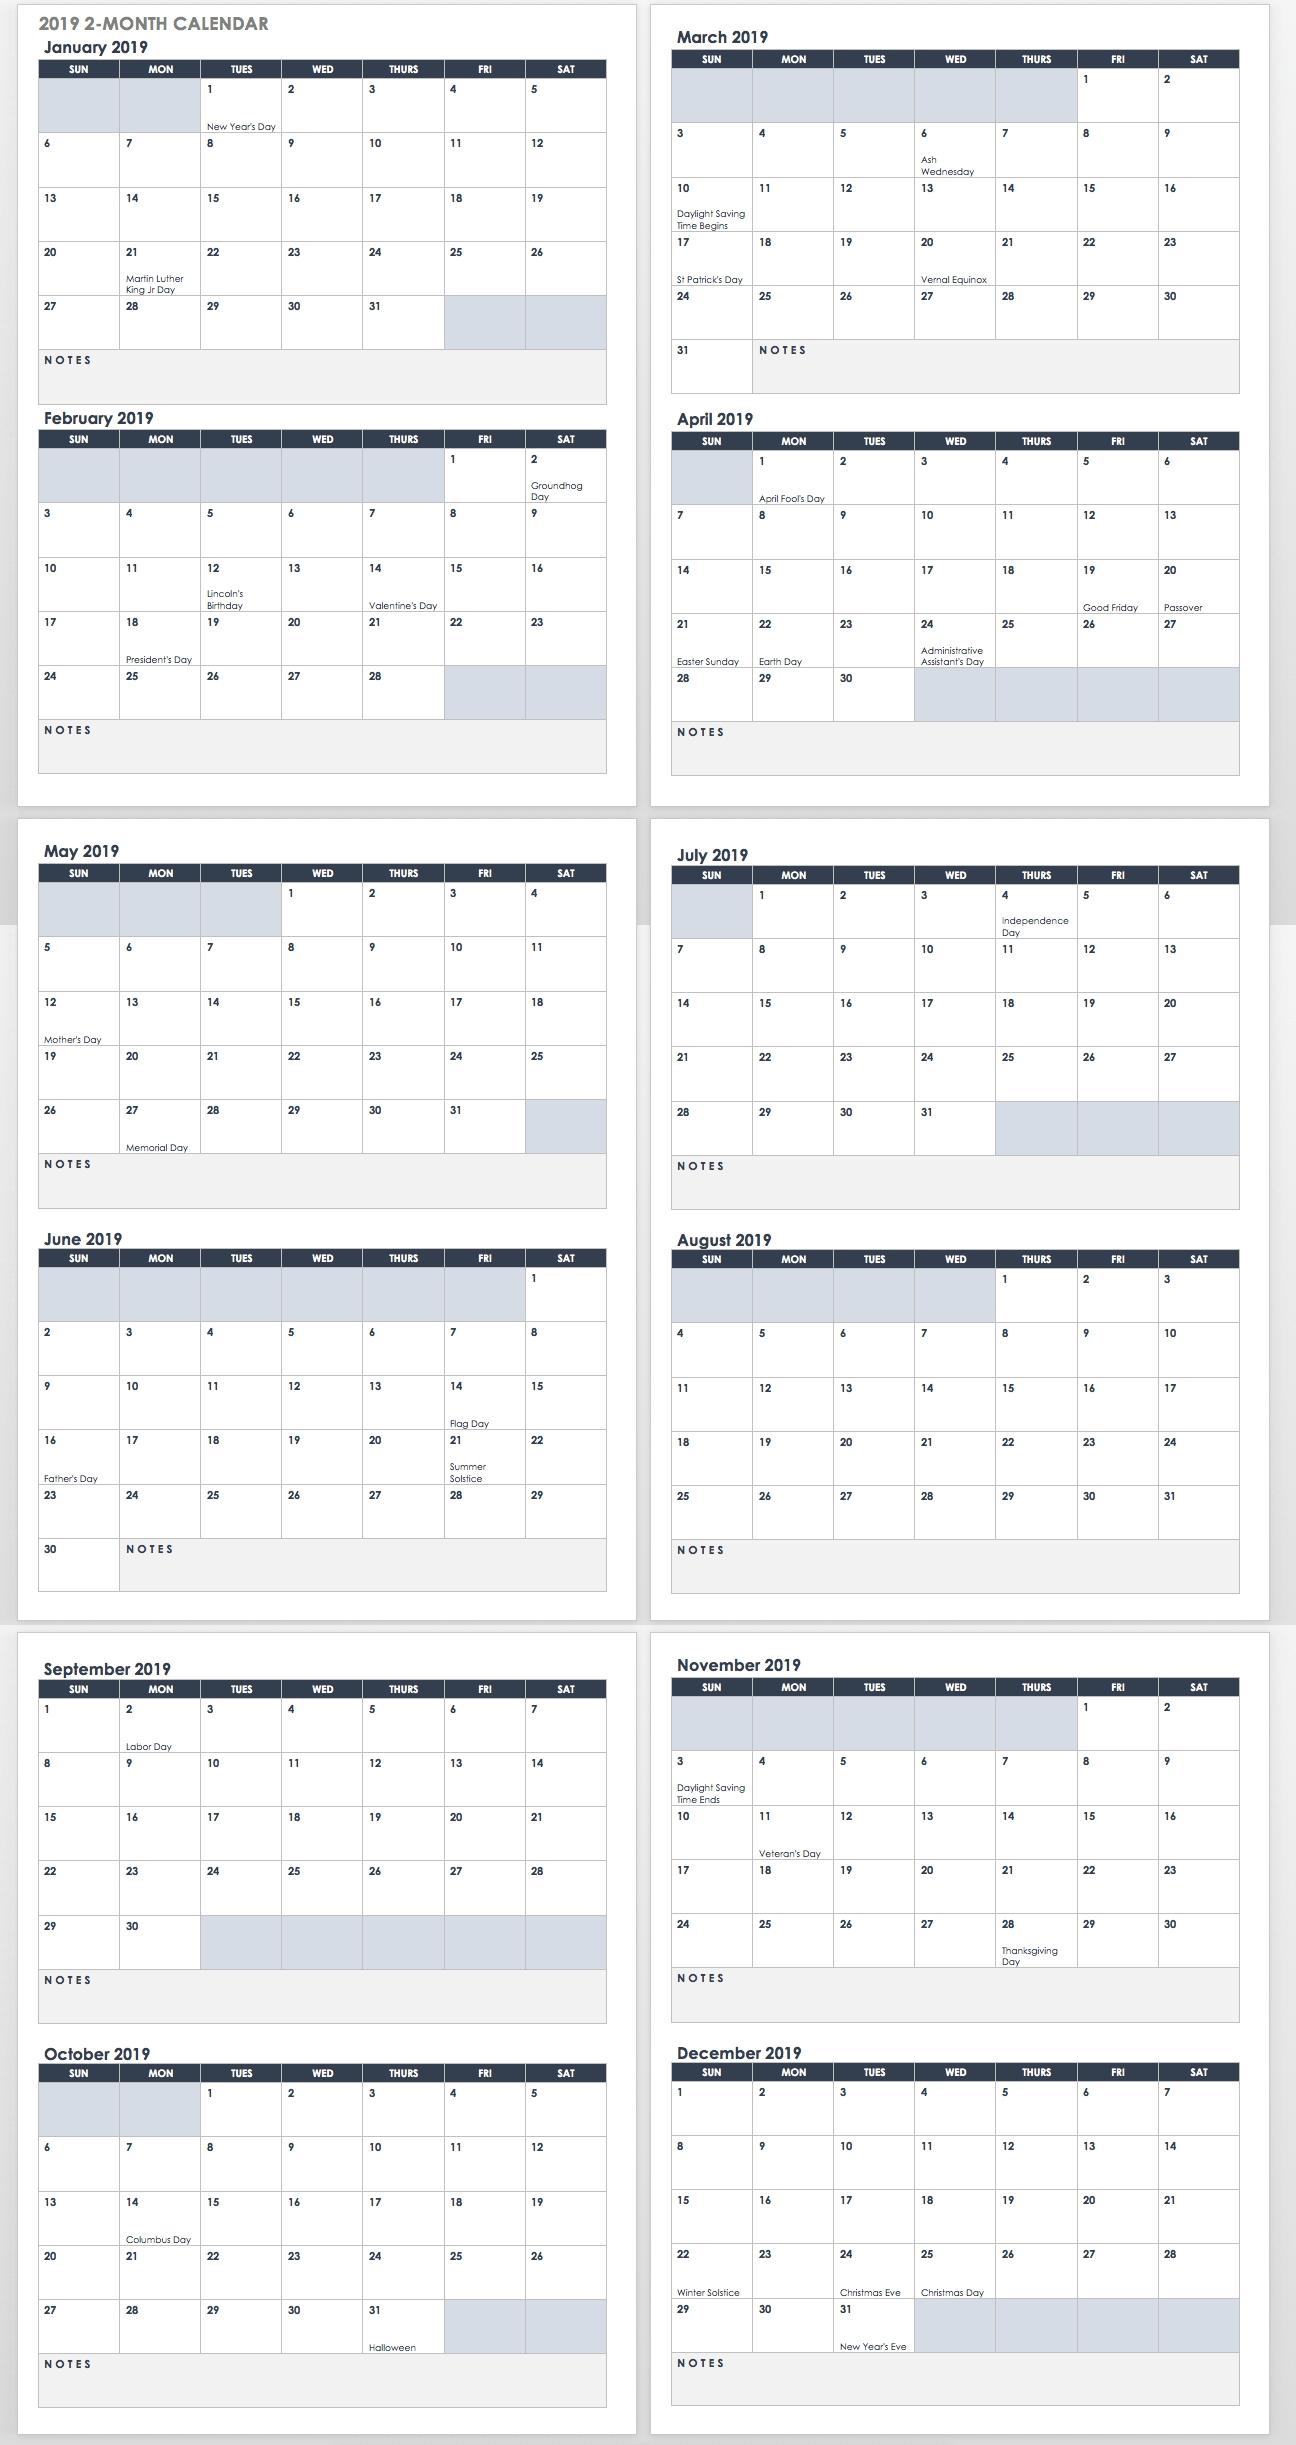 15 Free Monthly Calendar Templates | Smartsheet 2 Month Calendar 2019